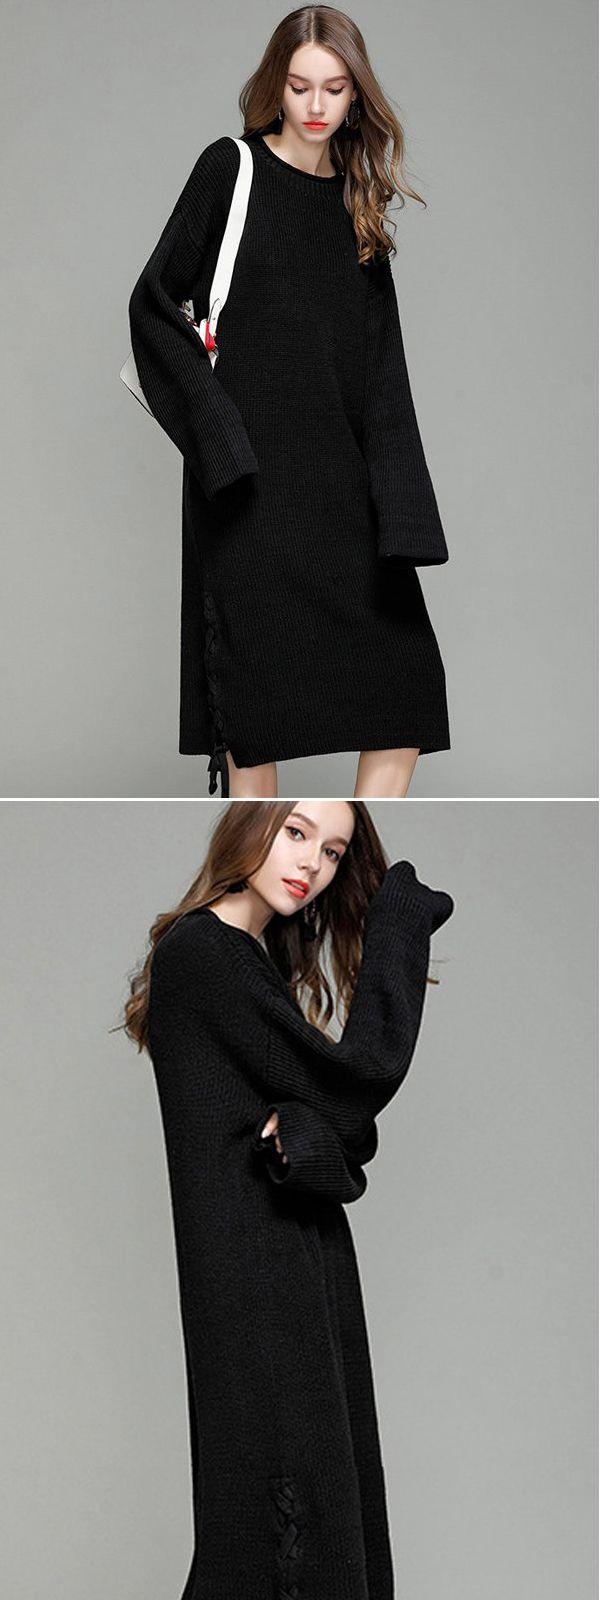 bb0ac55e627 Vinfemass Solid Color Lace Up Loose Sweater Dress  vinfemass  women   fashion  vintage